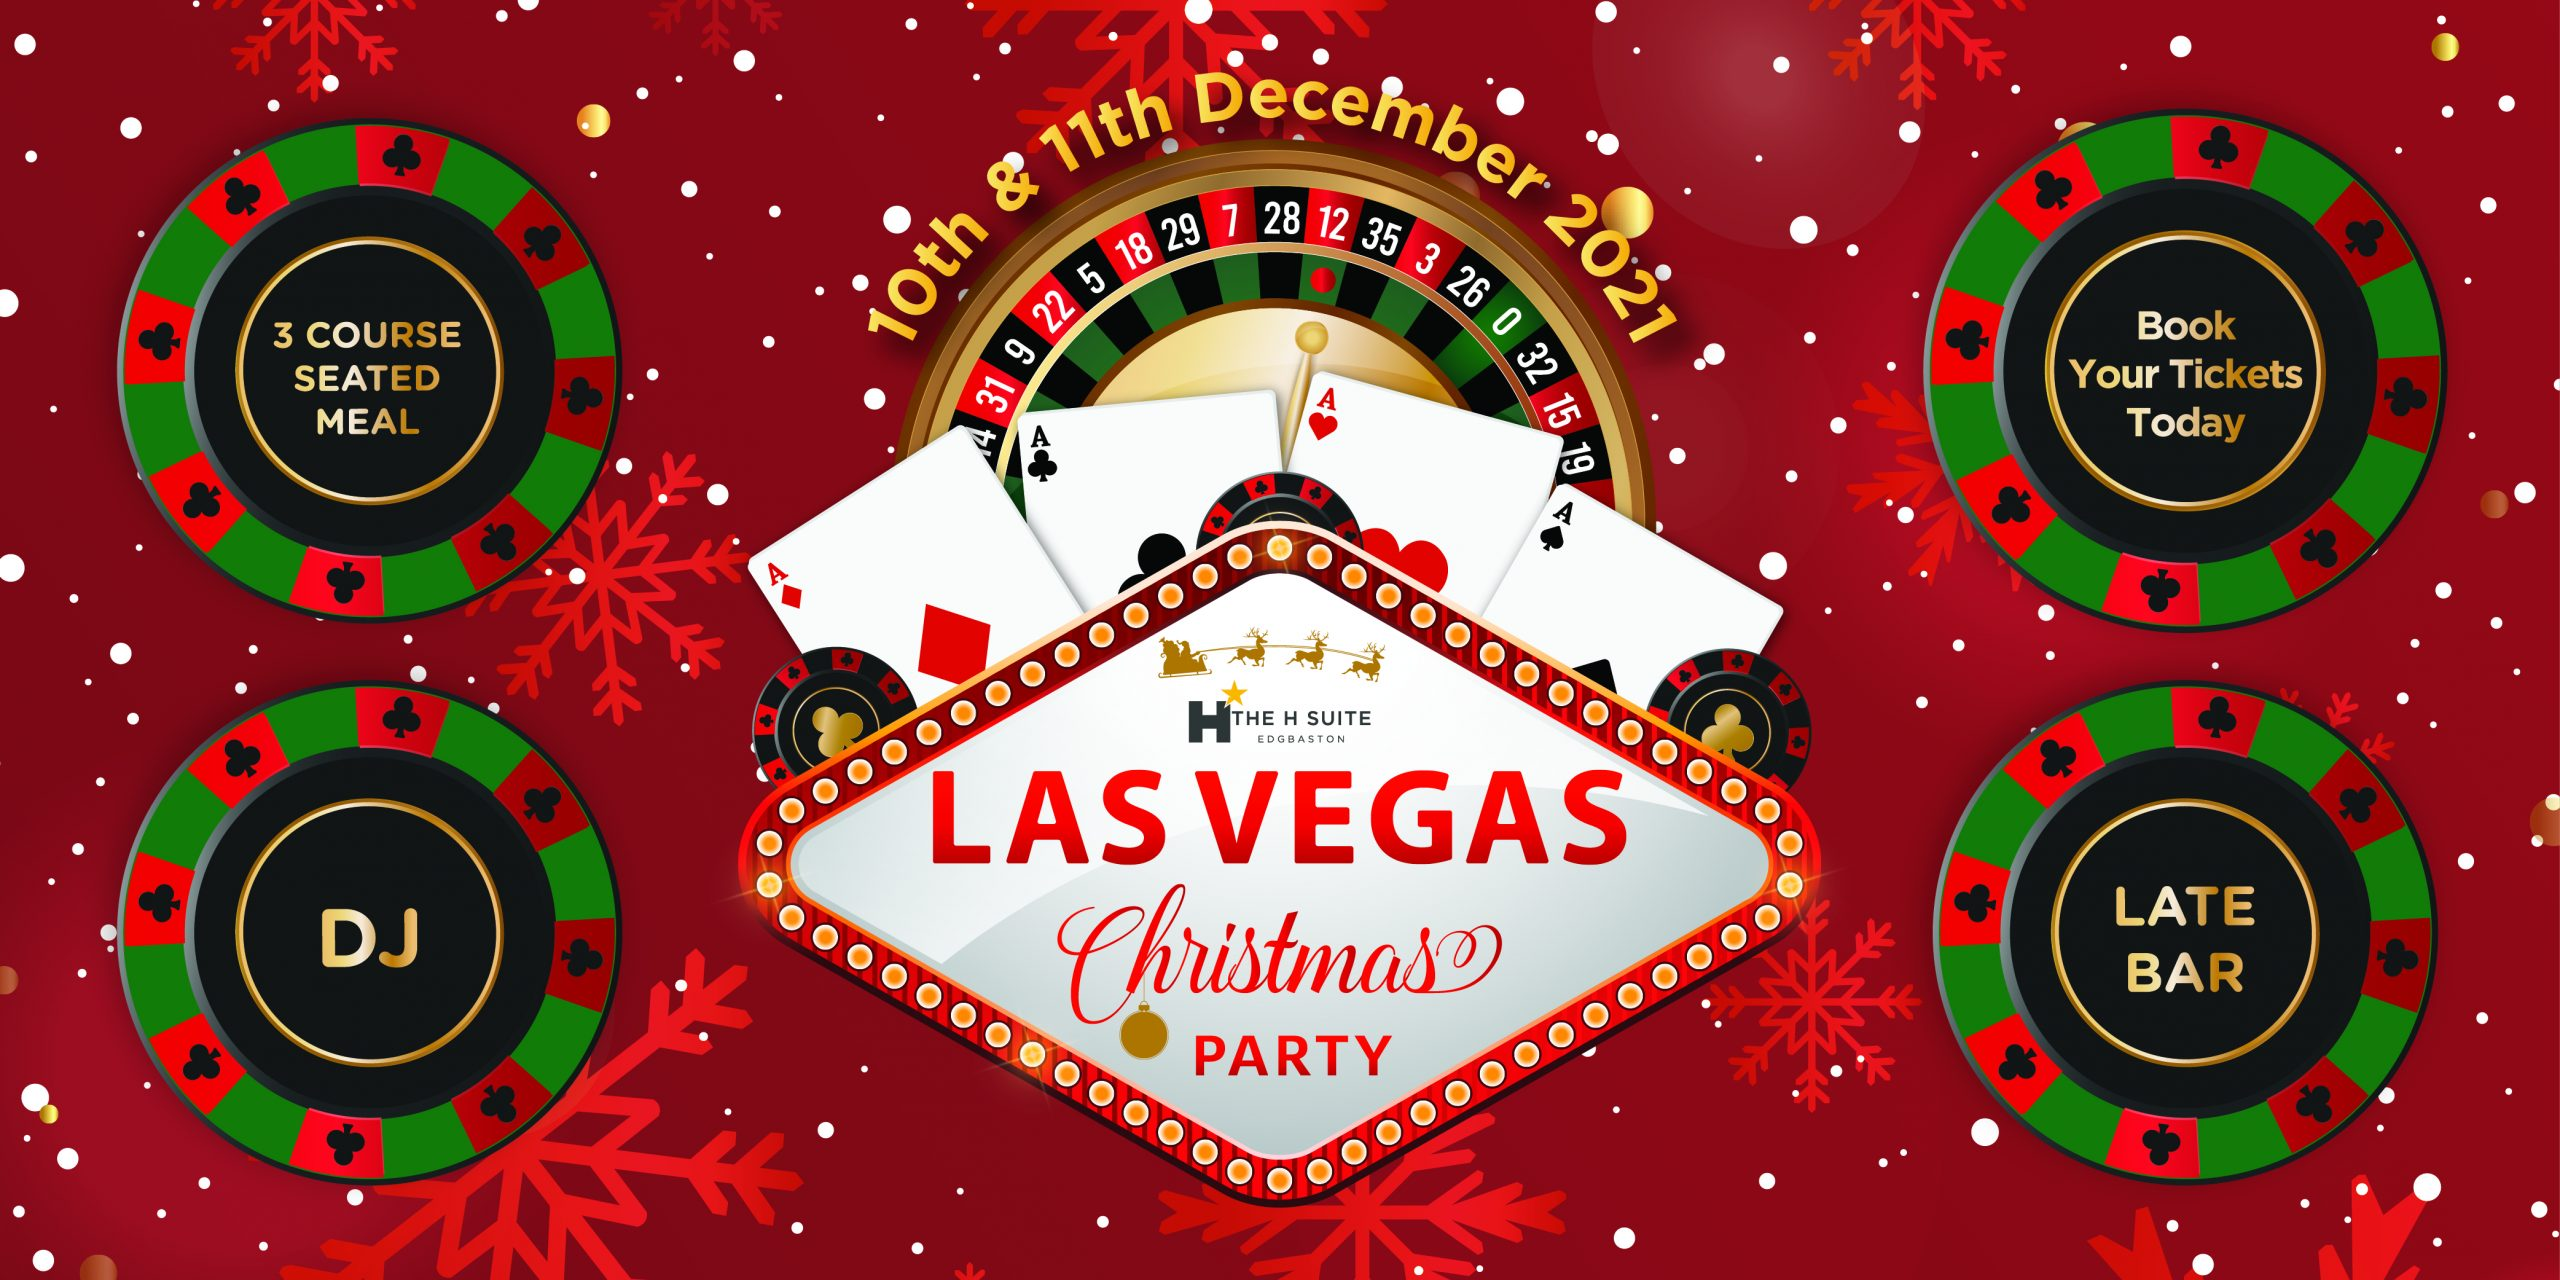 Las Vegas Christmas Party Nights Birmingham 2021